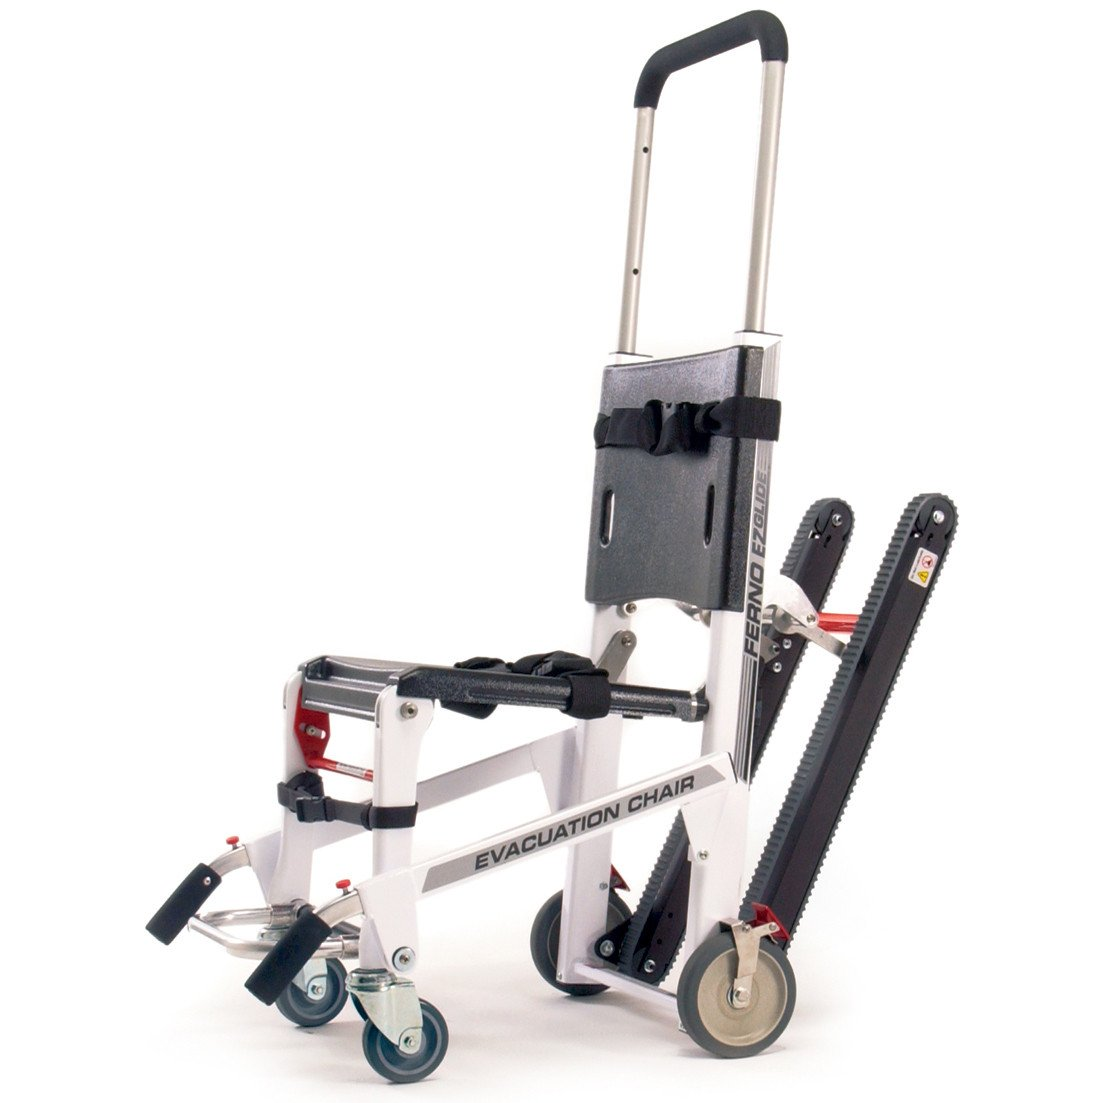 Ferno Model 59-E EZ-Glide Evacuation Chair